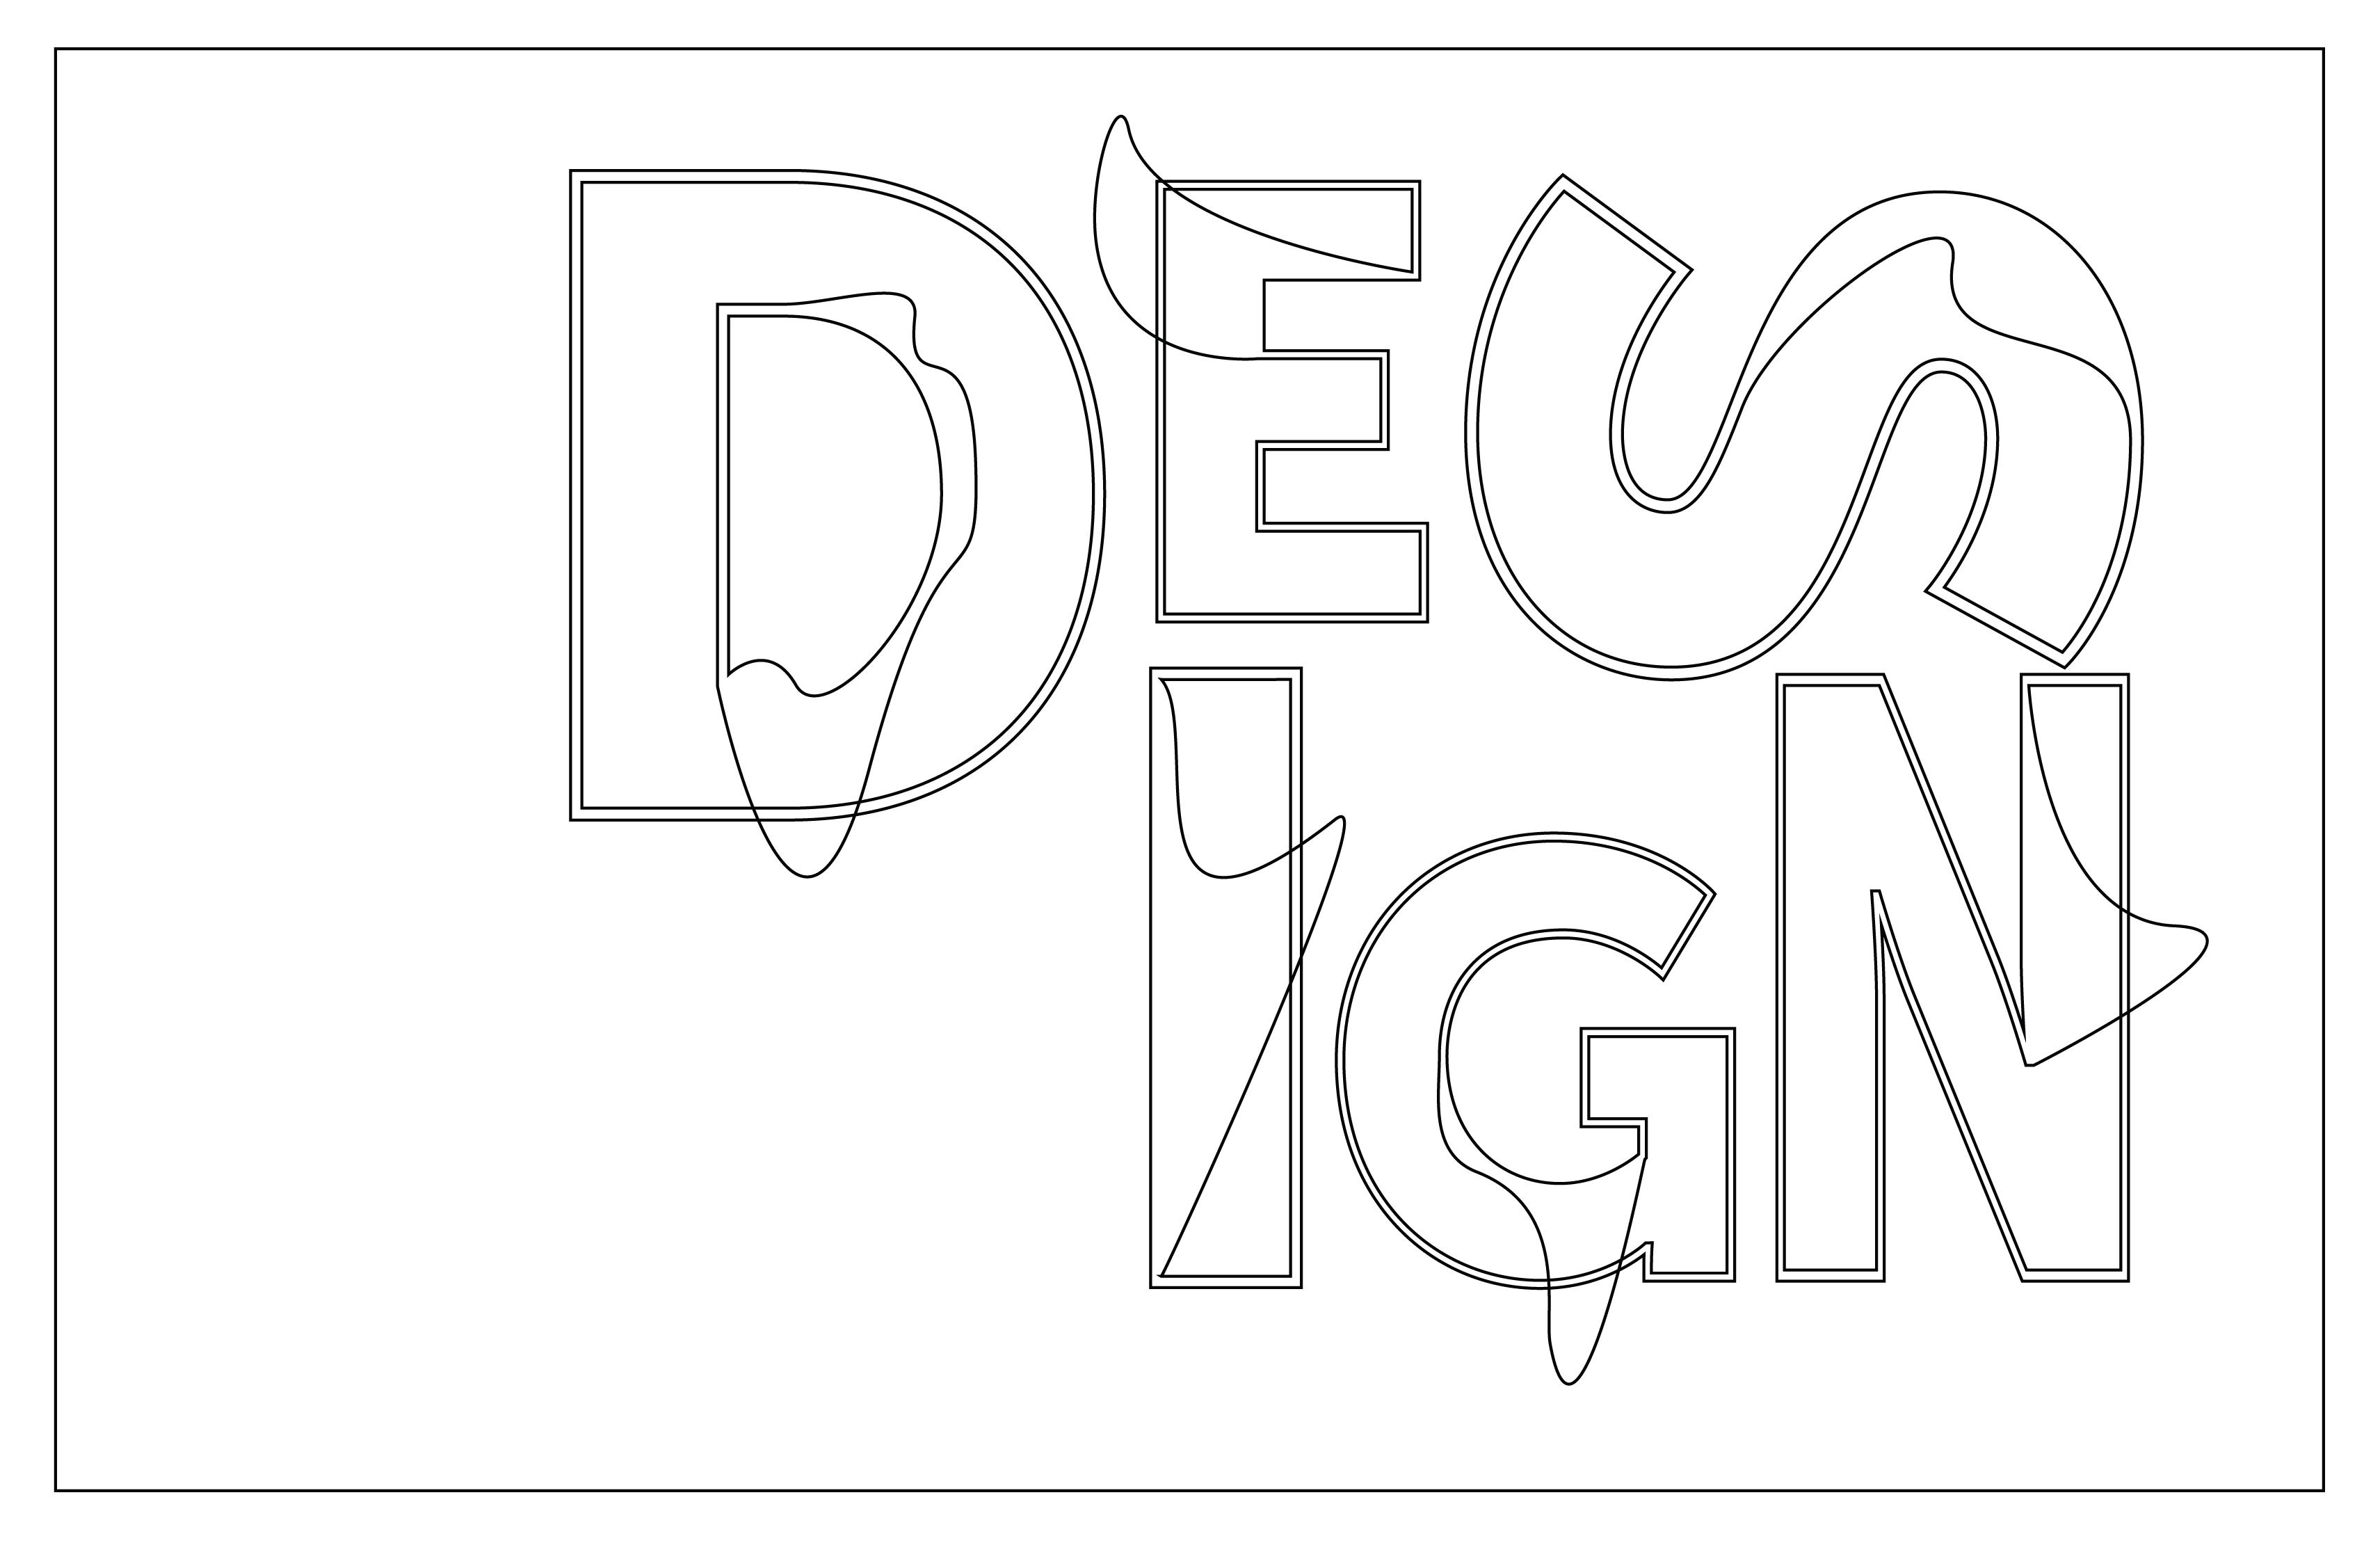 design_Tekengebied 1